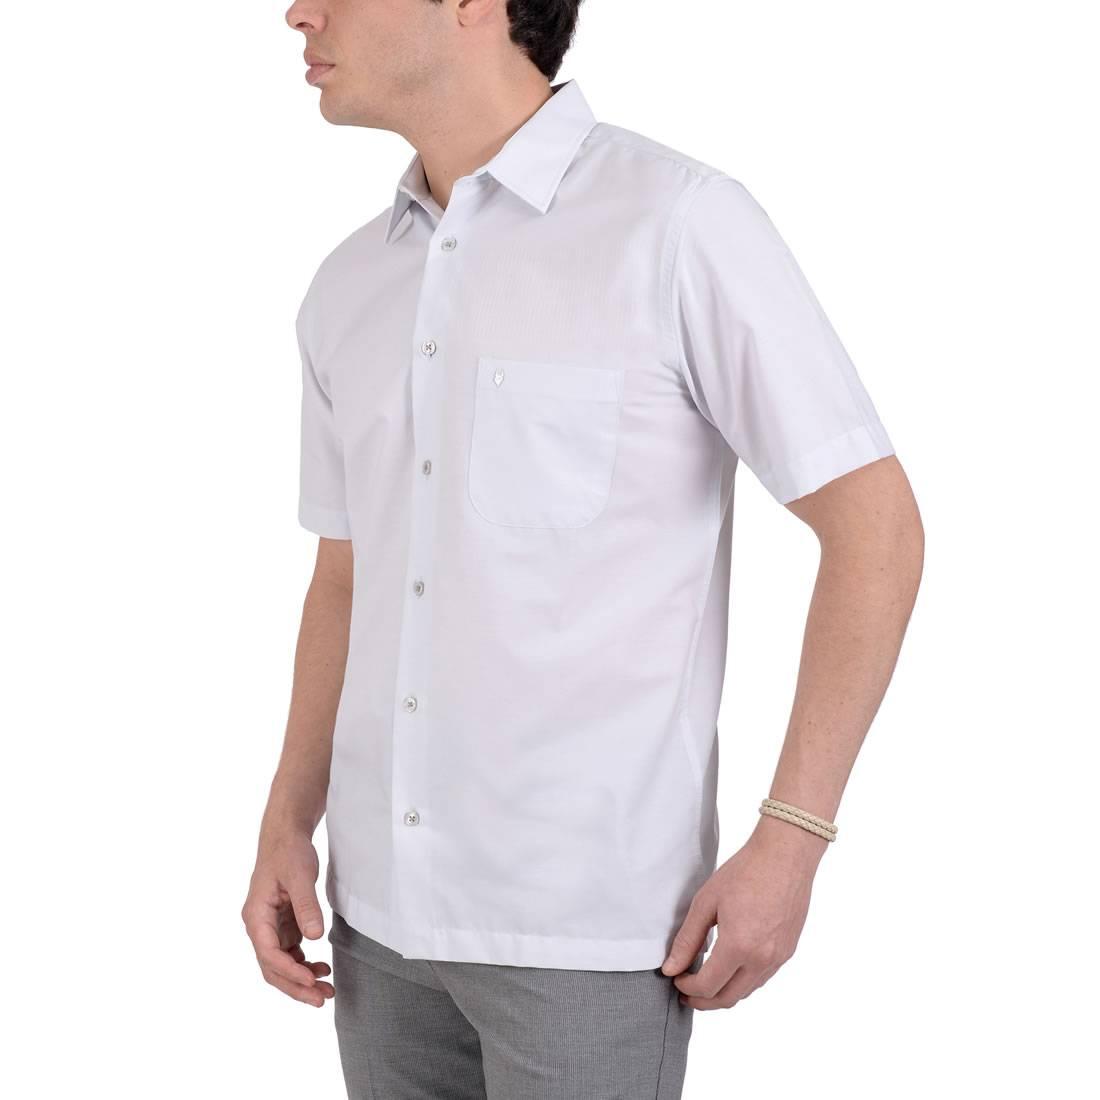 042379432106-02-Camisa-Casual-Manga-Corta-Classic-Fit-Gris-yale